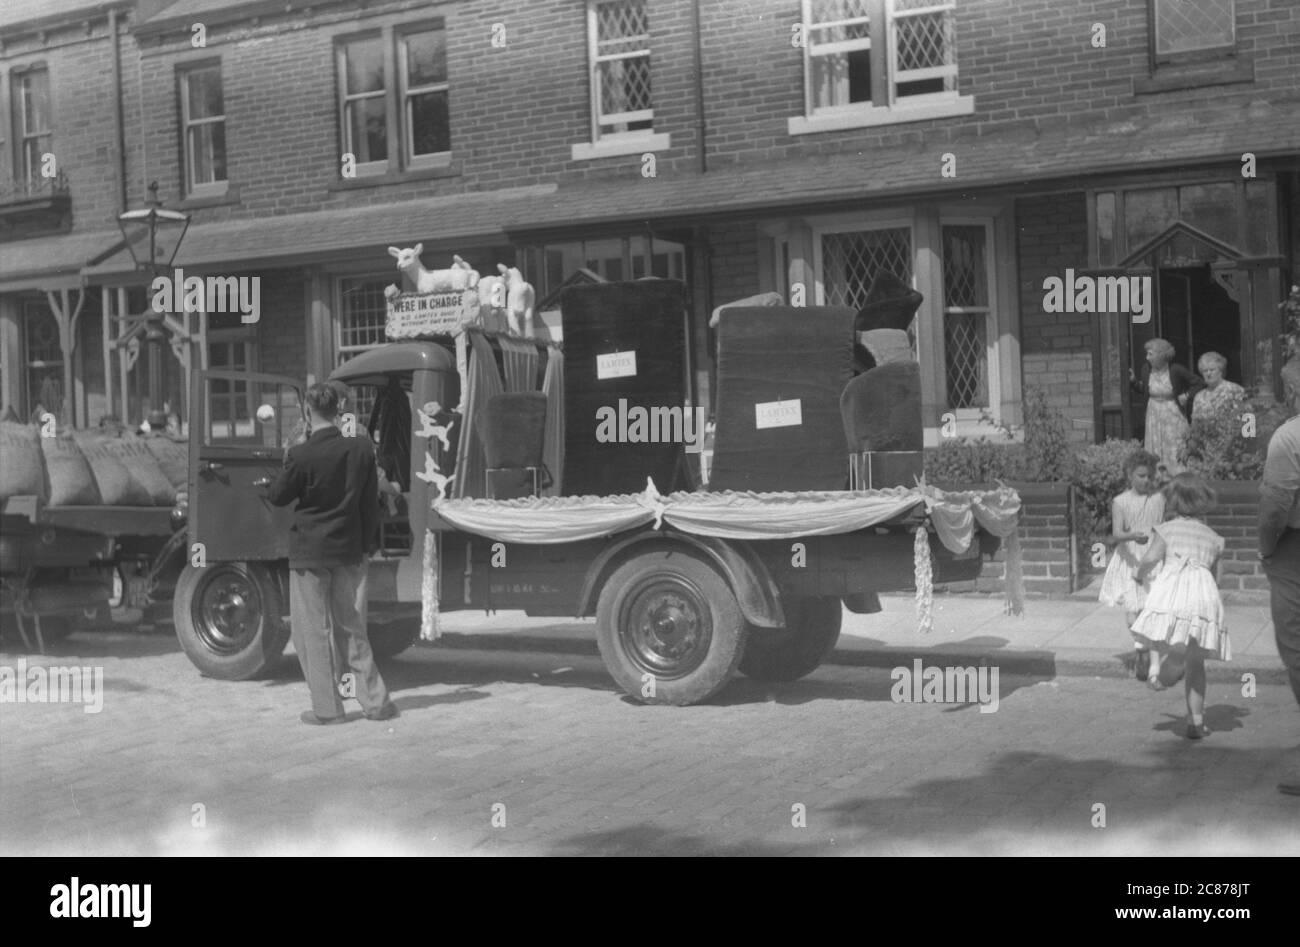 Procession de rue - Lamtex Float, Leeds, Yorkshire, Angleterre. Banque D'Images